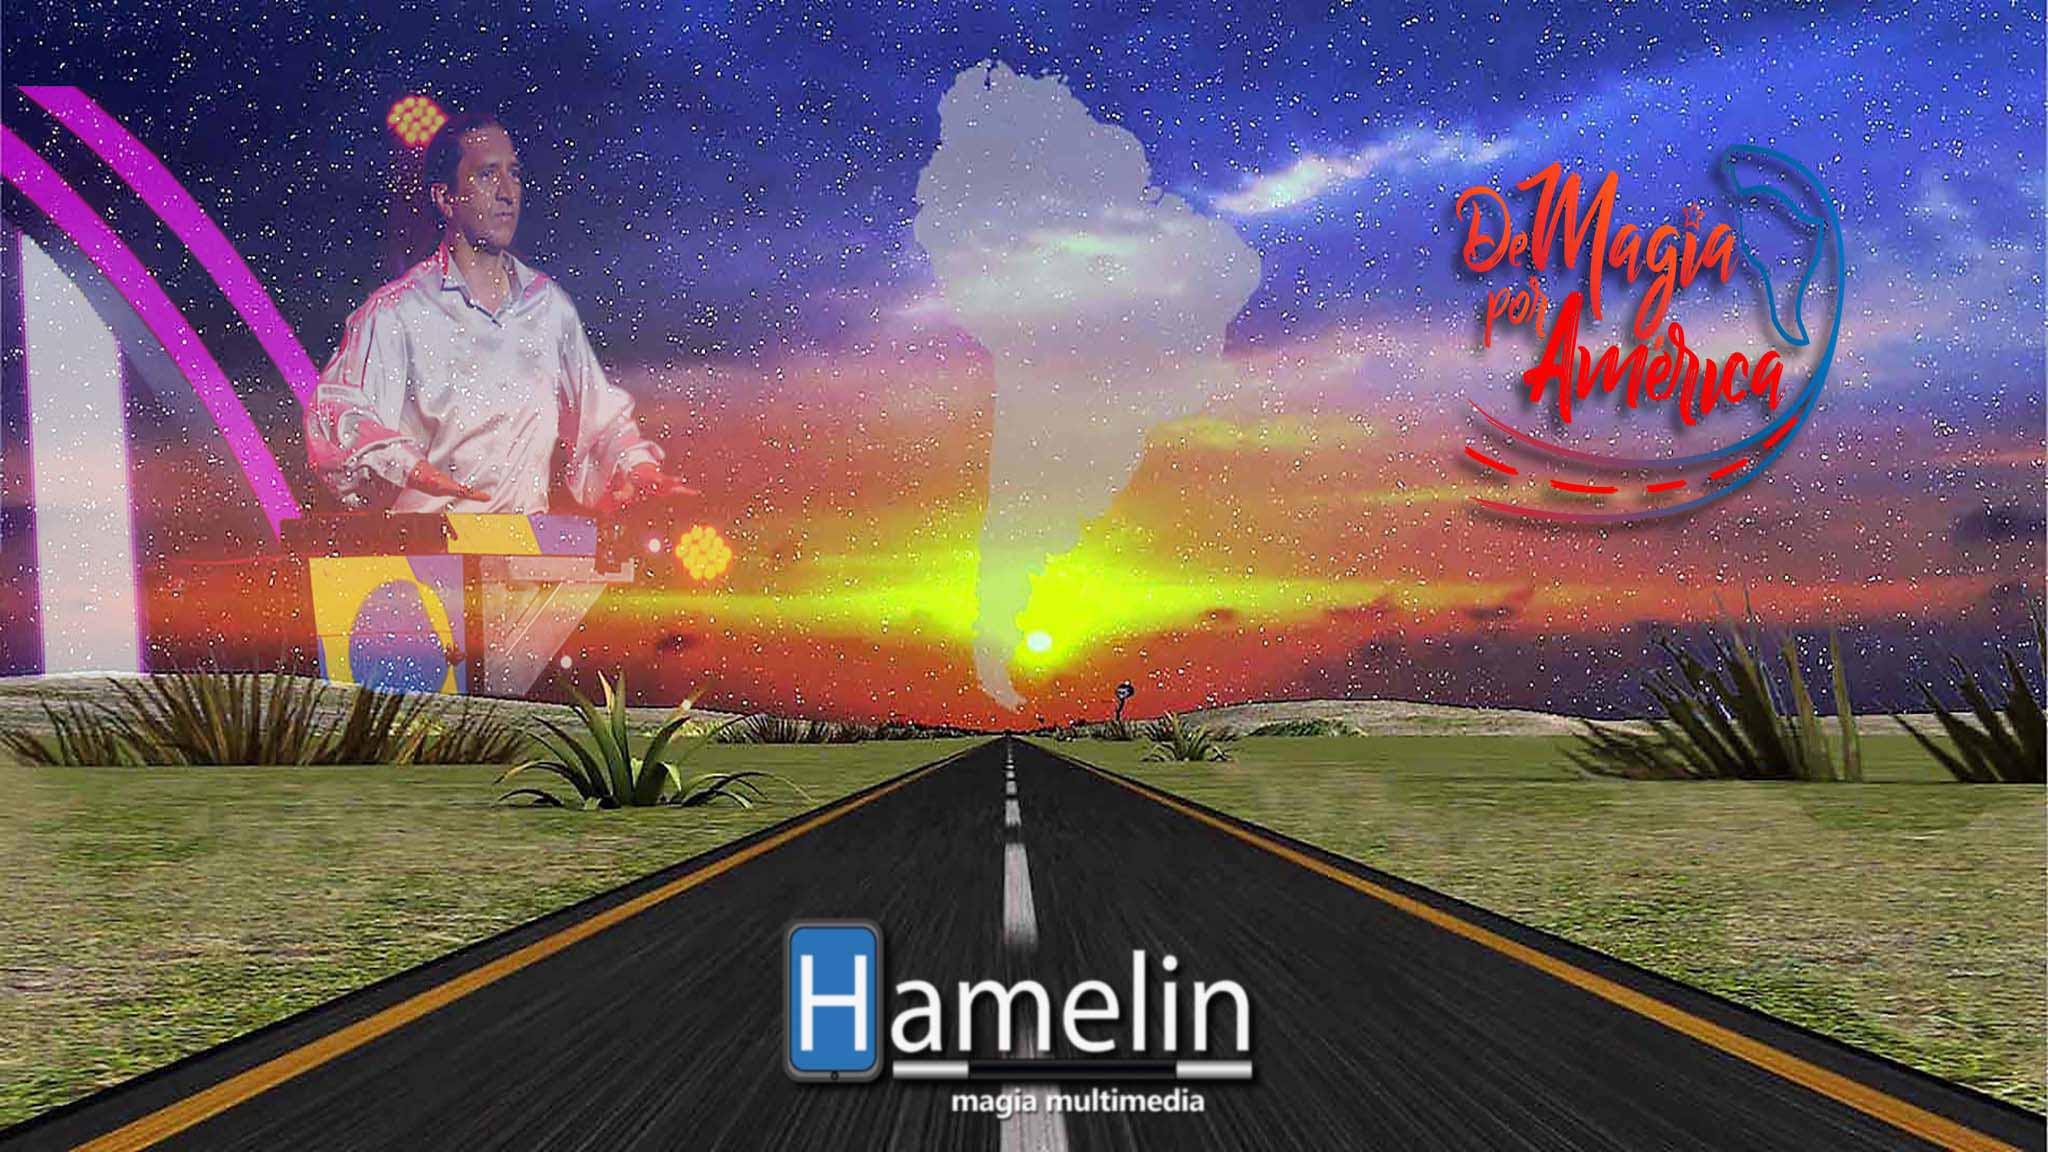 Hamelin Multimedia De Magia Por América